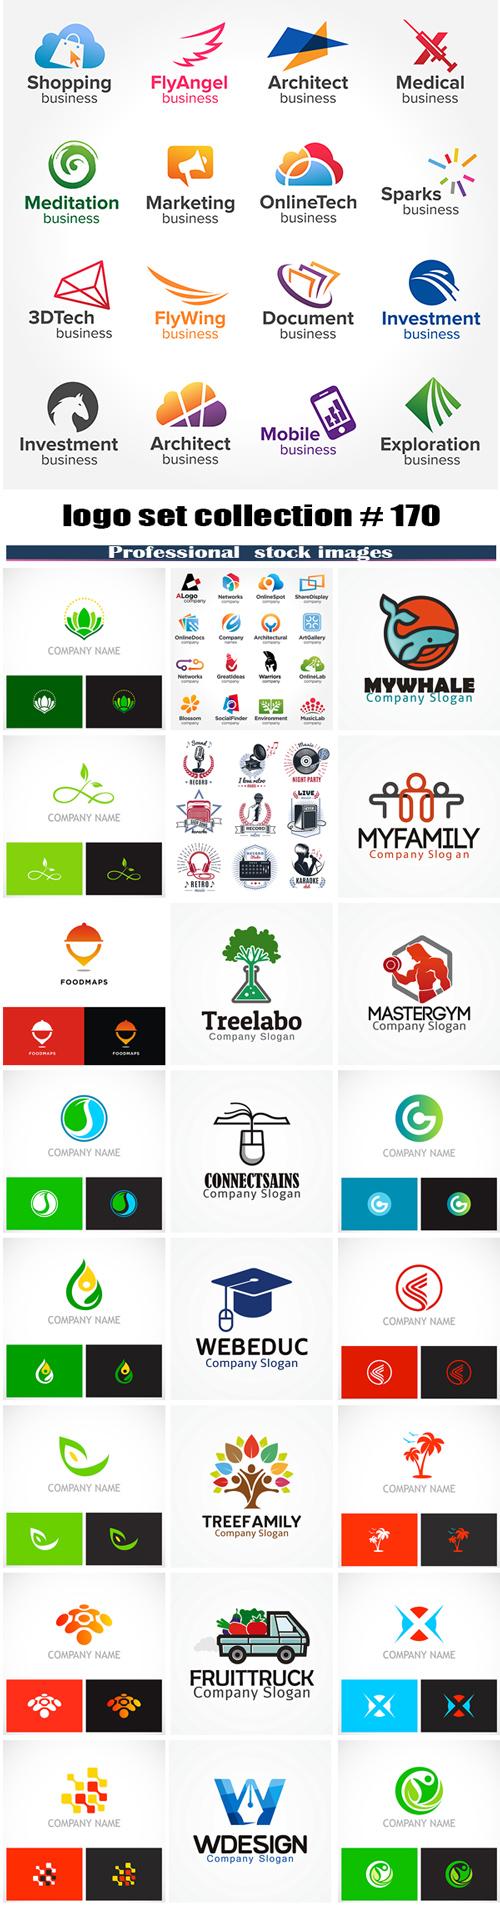 logo set collection # 170